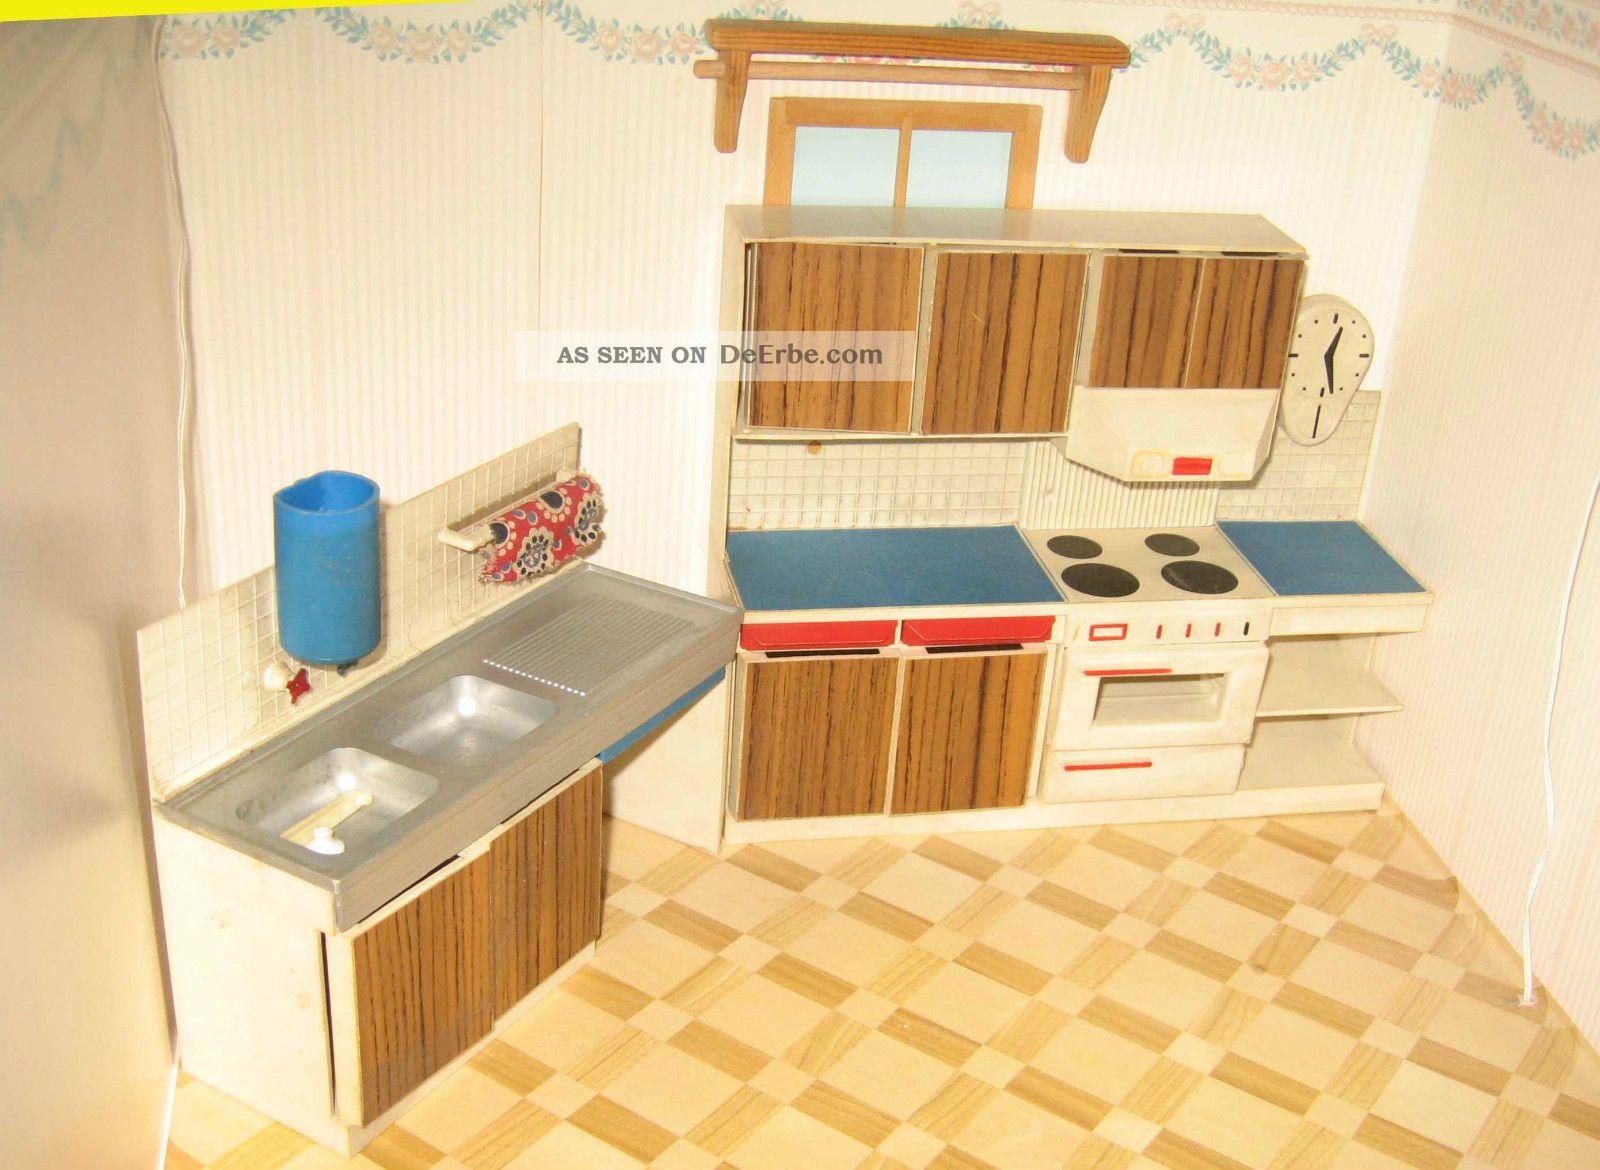 Konvolut vero mobel kuche schrank puppenstube puppenhaus for Puppenhaus küche